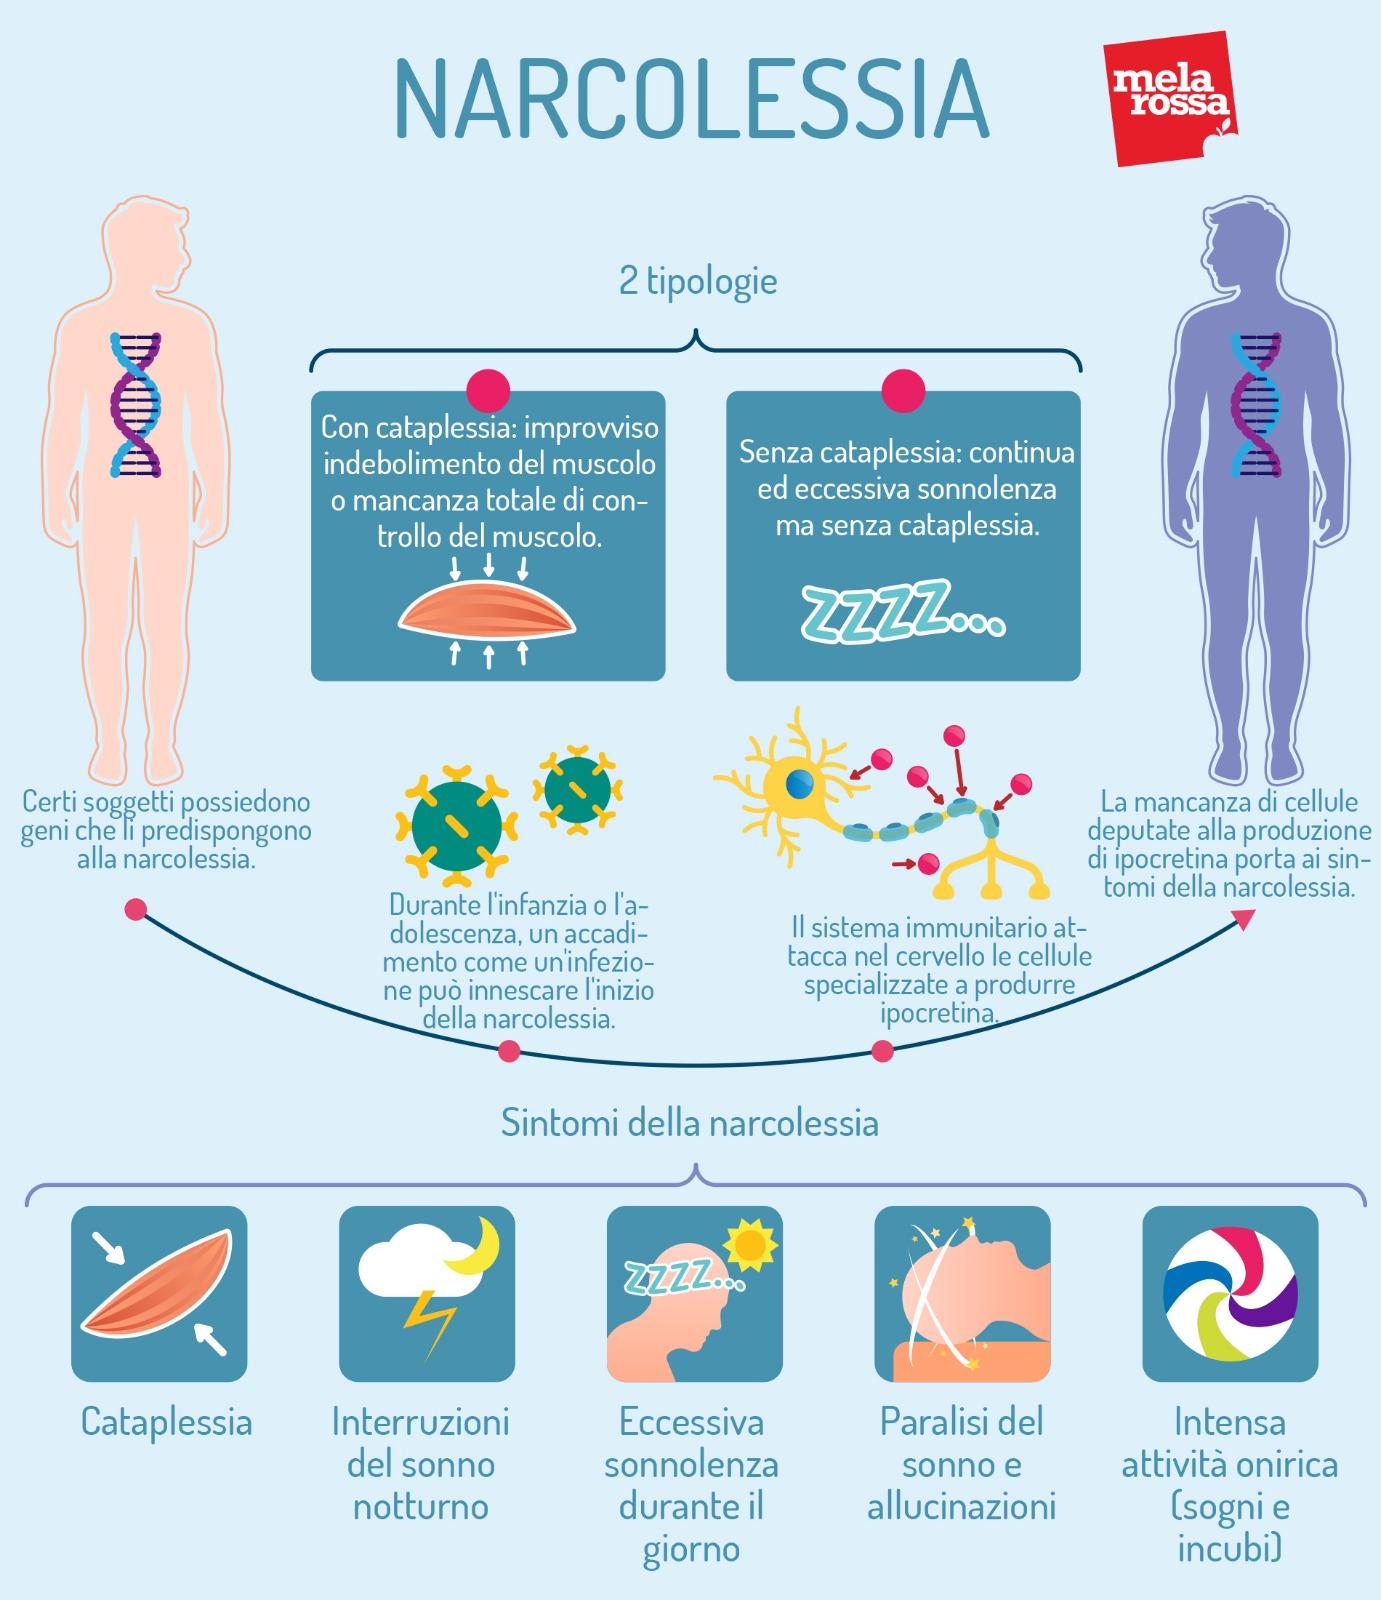 Narcolessia: tipologia e sintomi